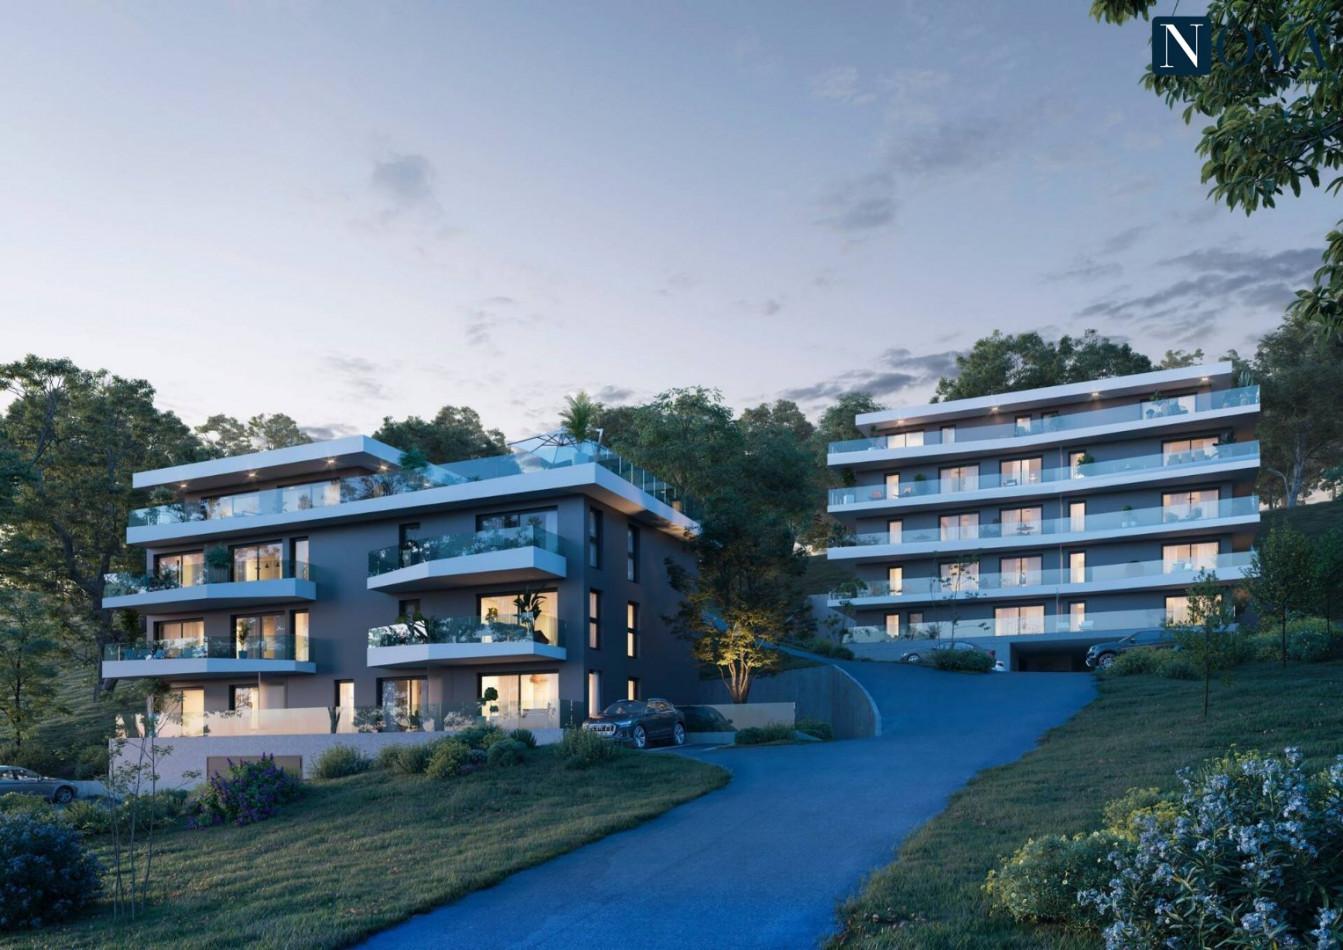 A vendre  Evian Les Bains | Réf 74029704 - Nova solutions immobilieres